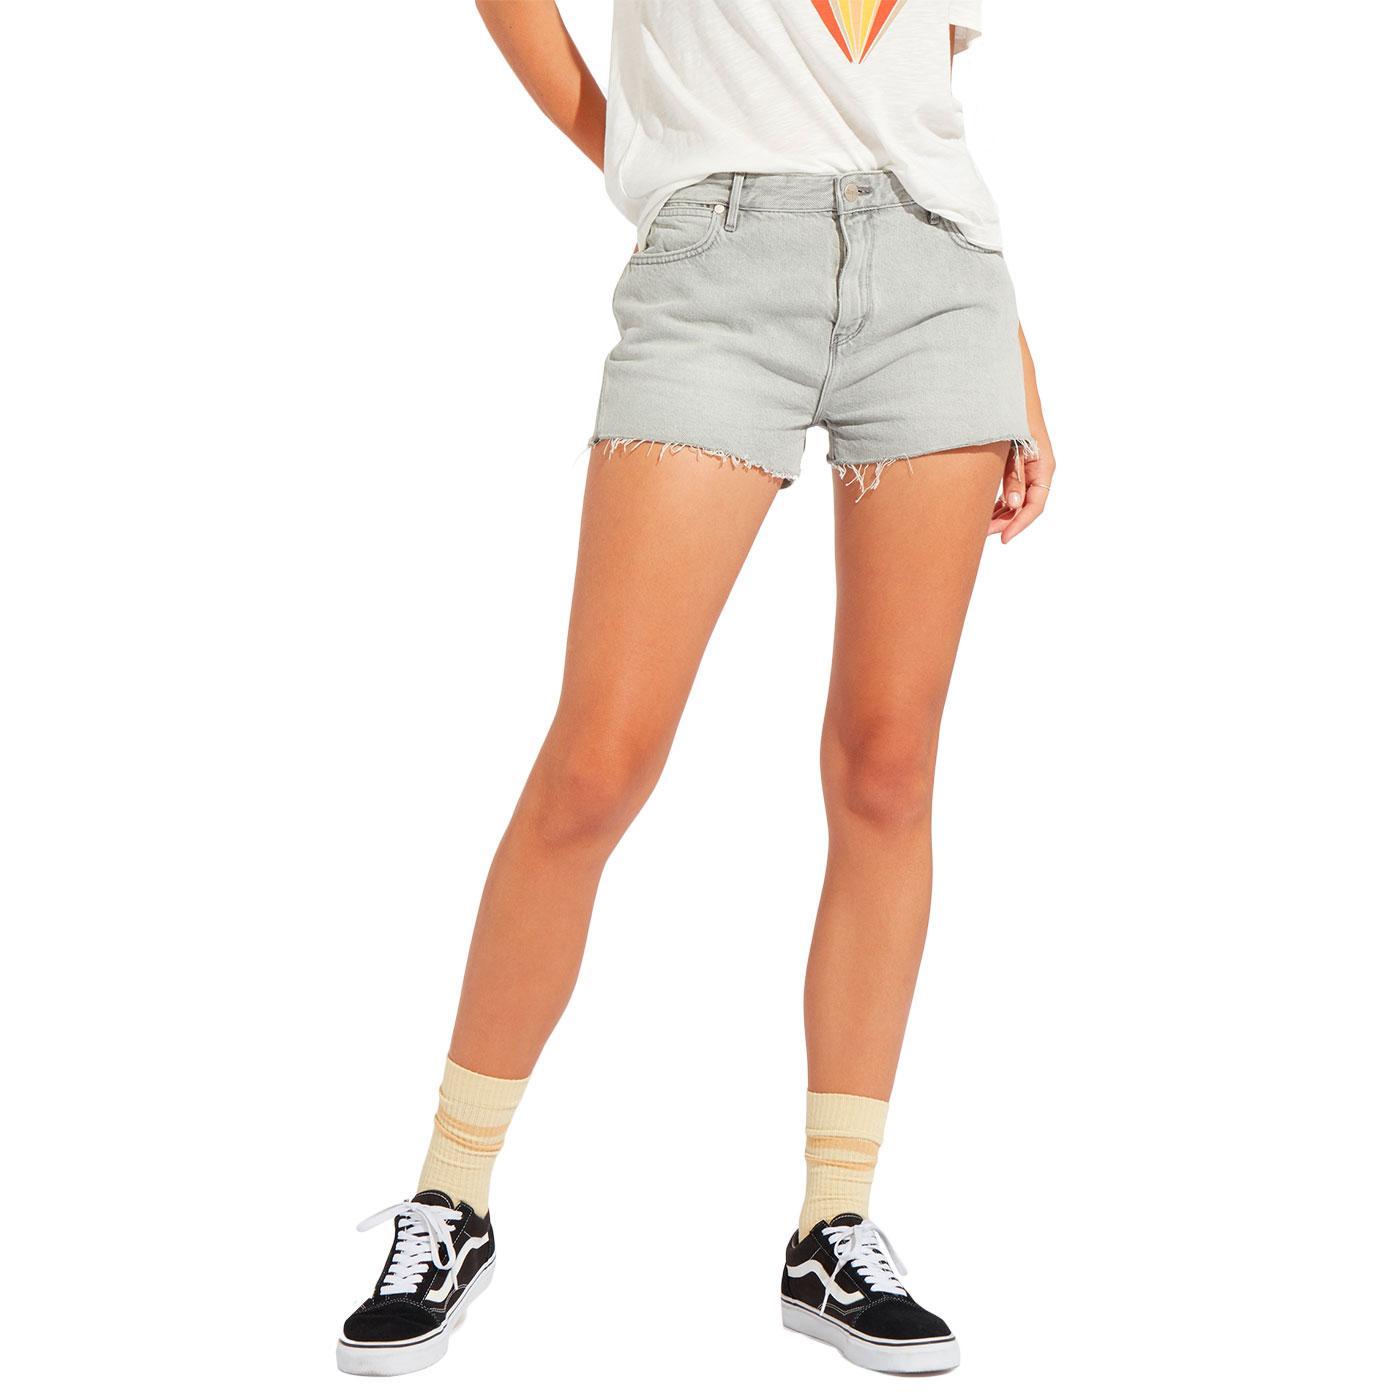 WRANGLER Women's Retro Boyfriend Shorts (Icy Grey)